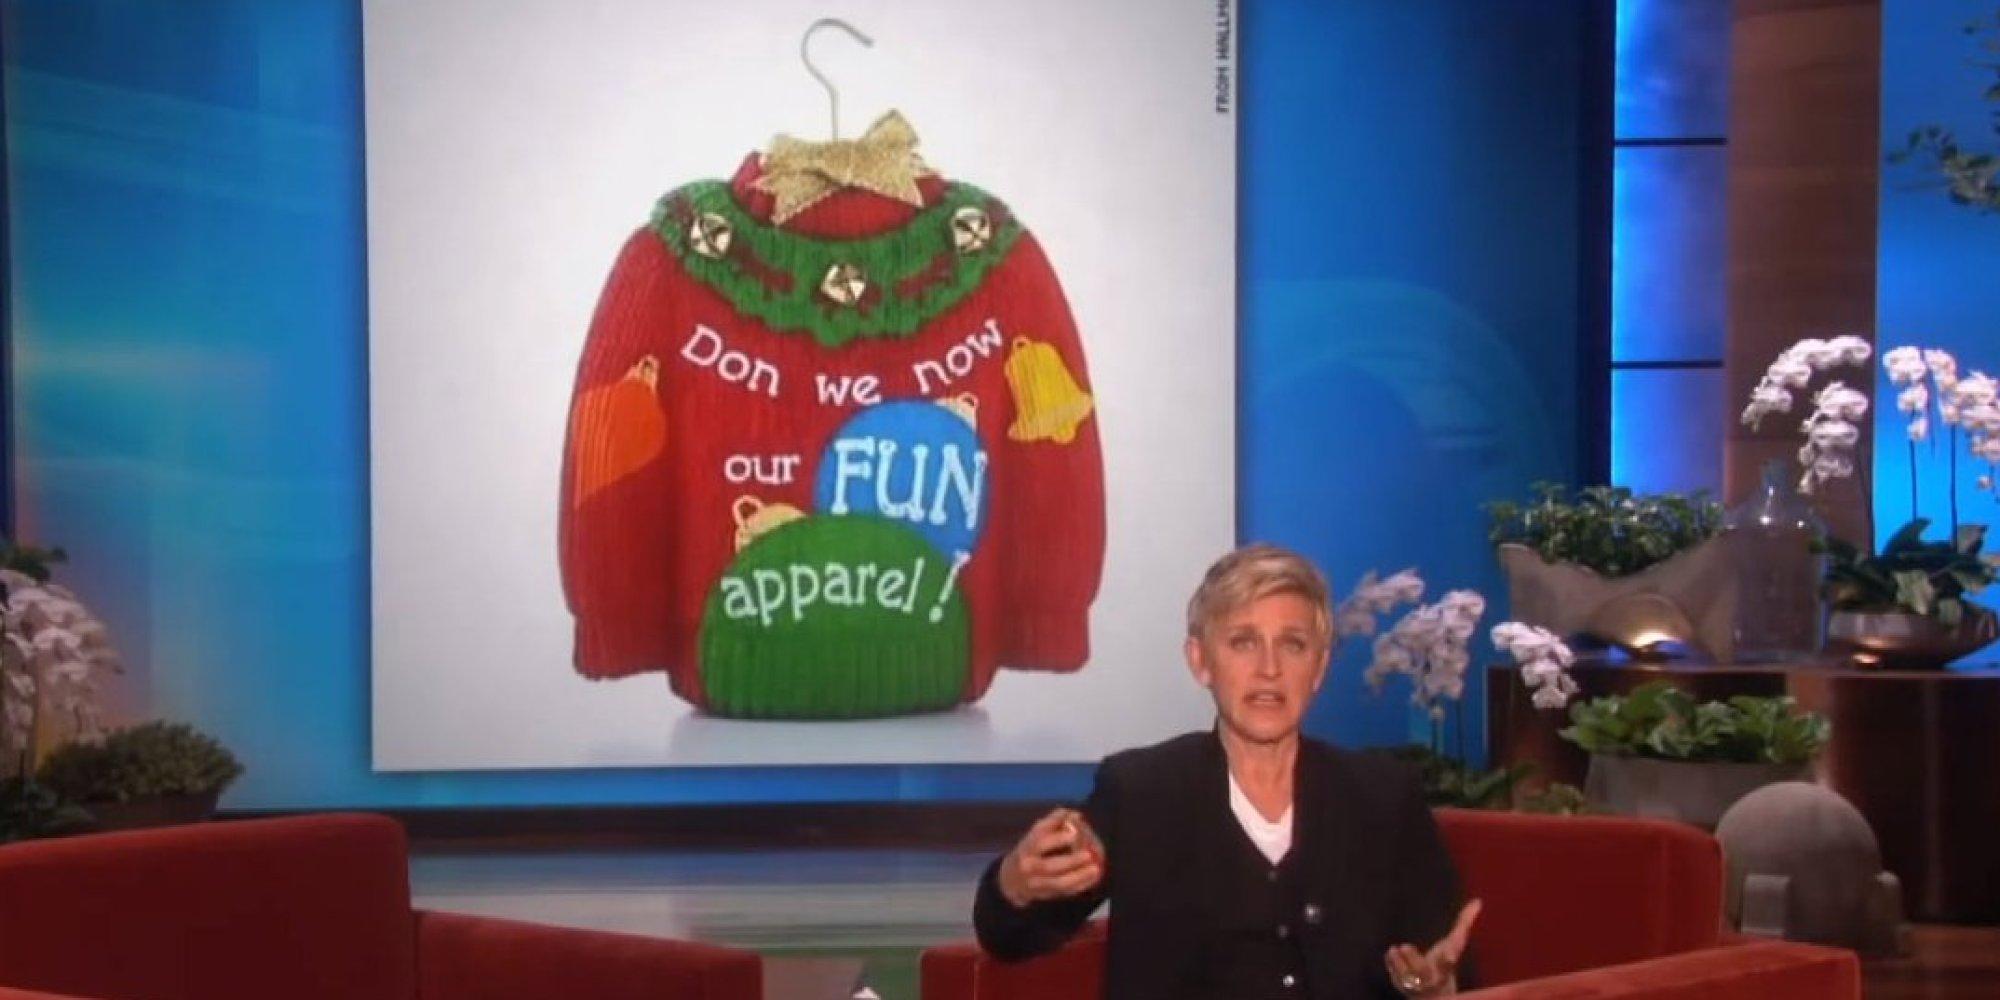 Ellen degeneres on hallmark 39 s gay ornament controversy - Hallmark espana ...